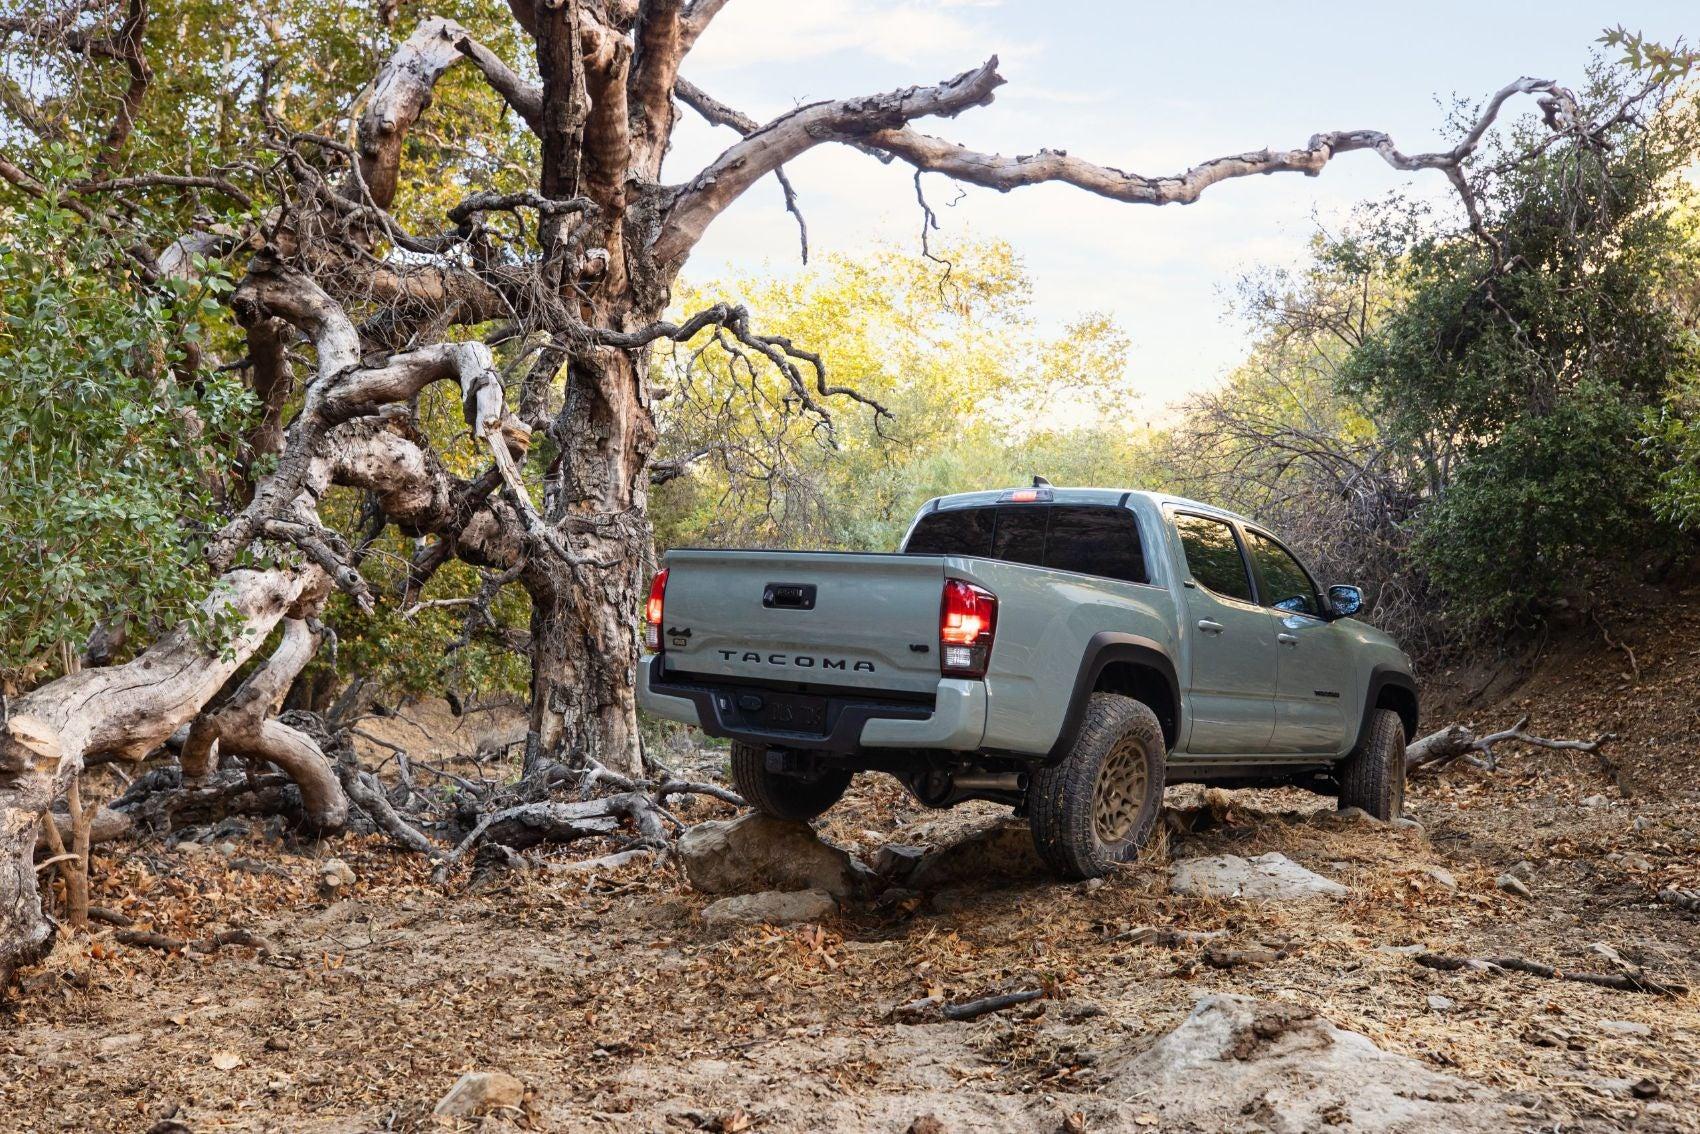 2022 Toyota Tacoma Trail Edition: The Goldilocks of Toyota's Perfect Off-Road Family